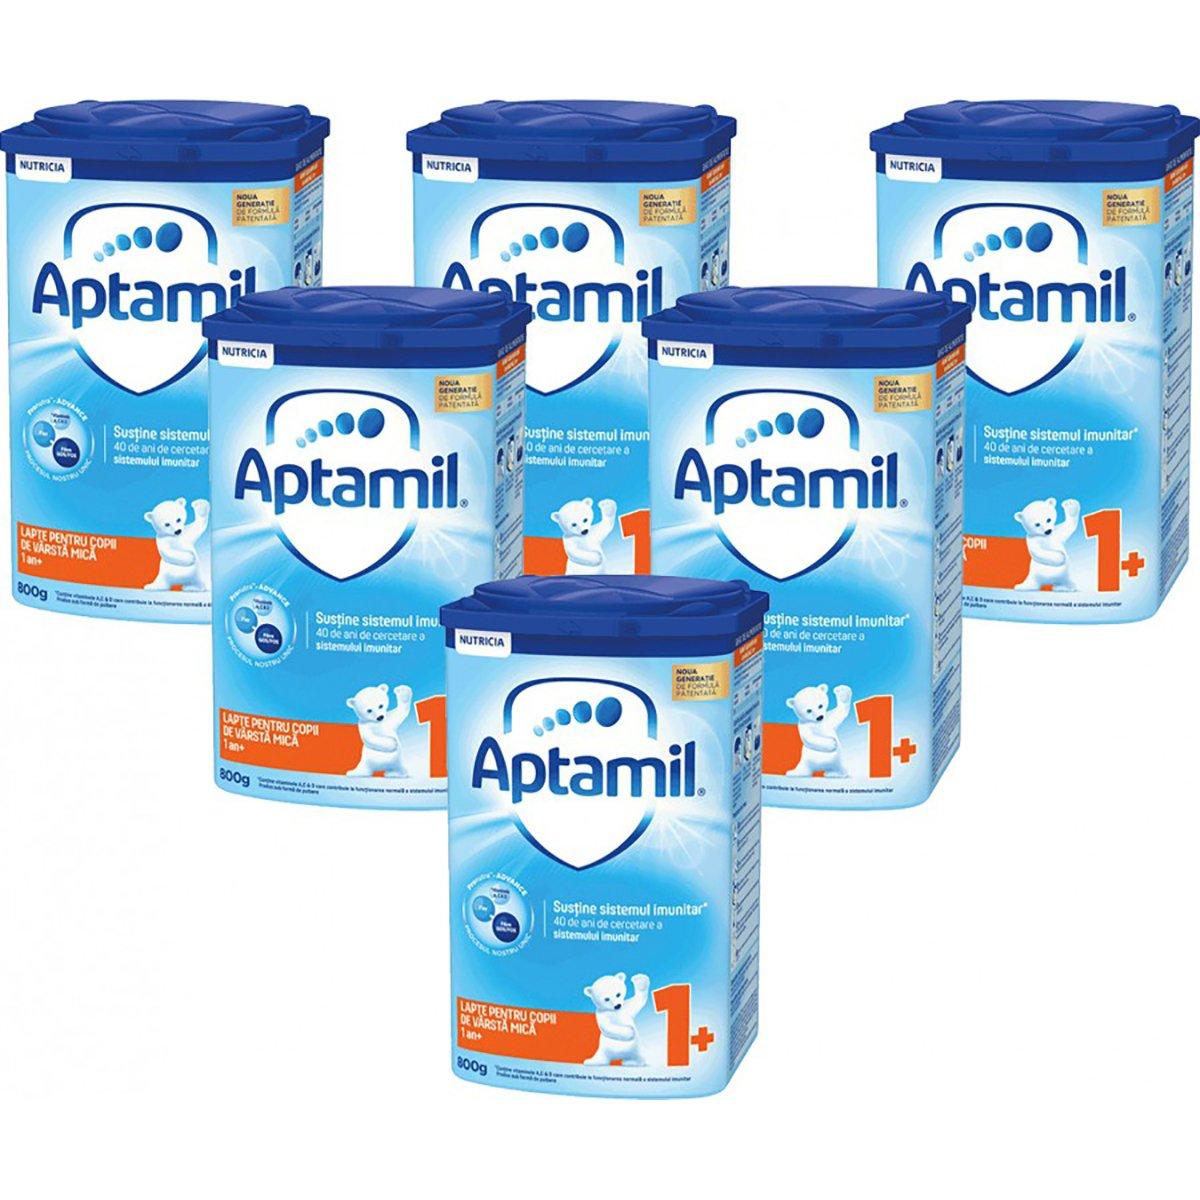 Lapte praf Aptamil Junior 1+, 6 pachete x 800 g imagine